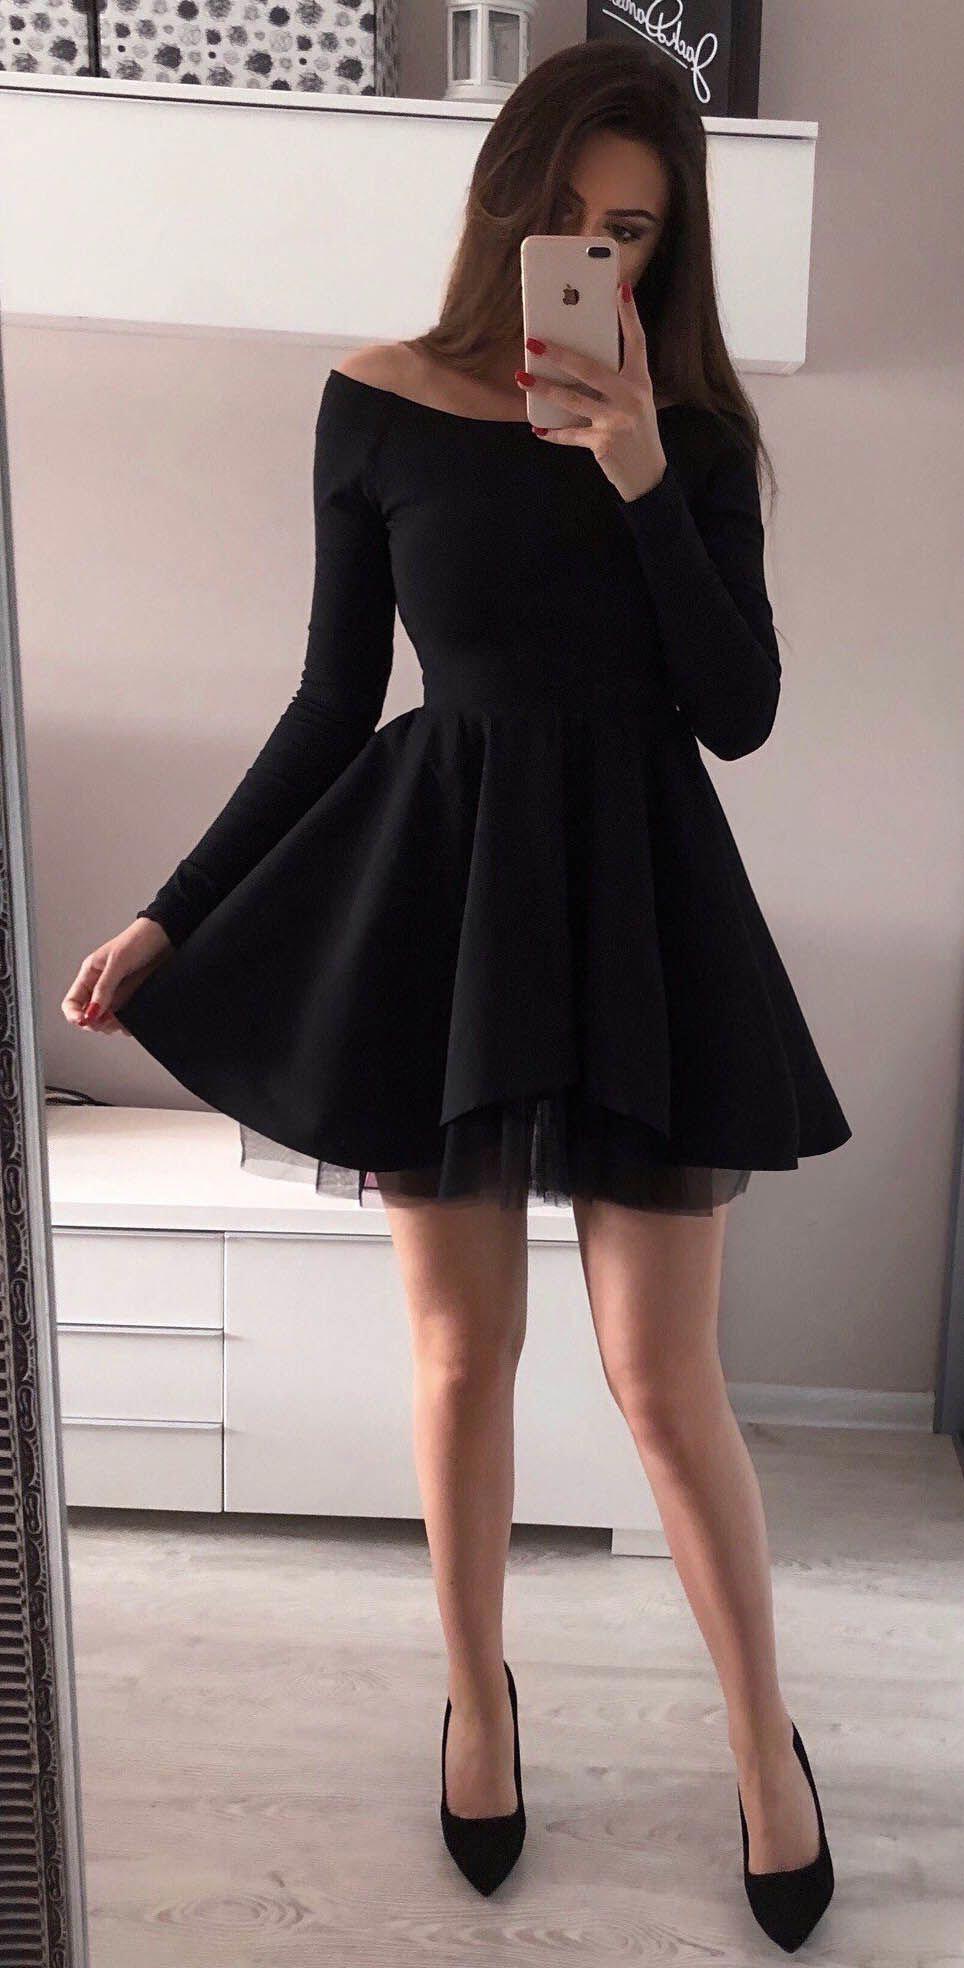 Simple hoco dressesblack homecoming dresses short prom dresscheap